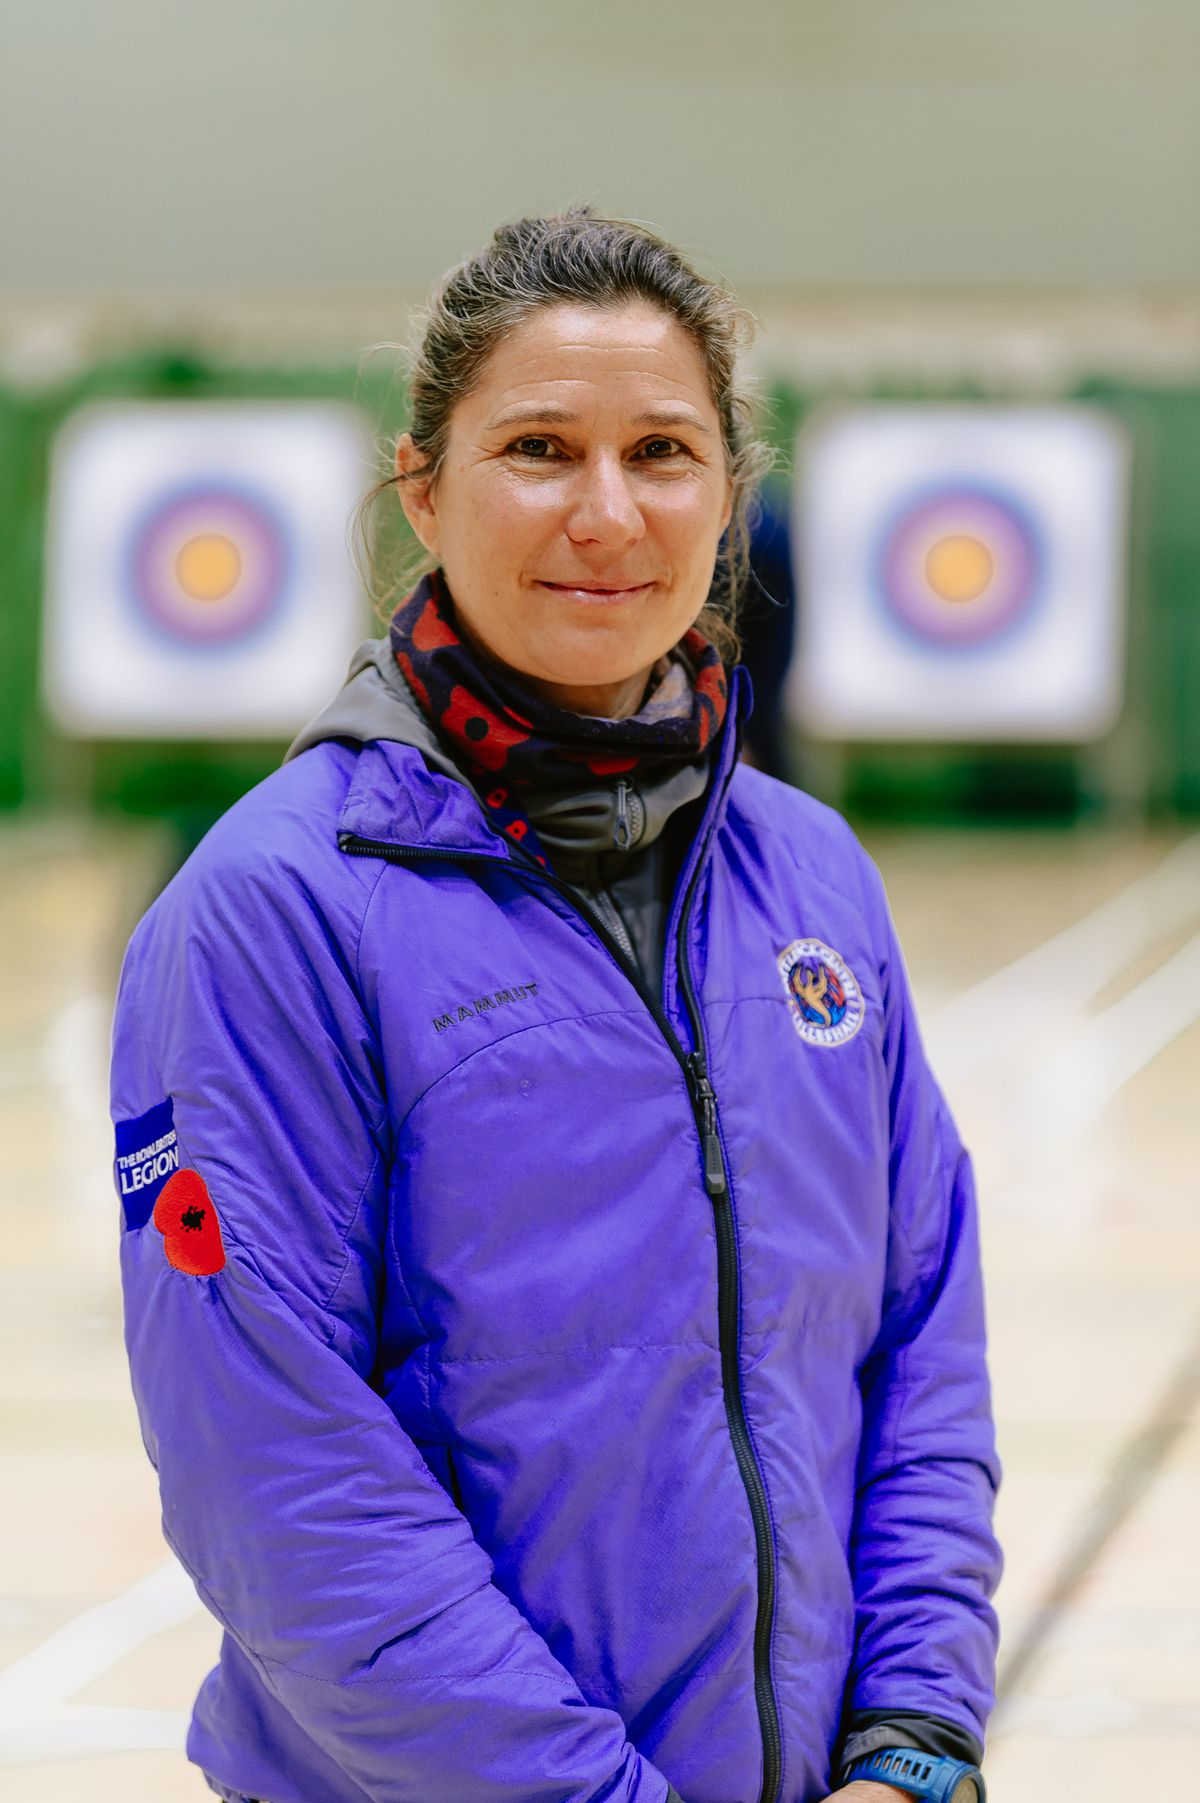 Archery instructor Michaela Barwick